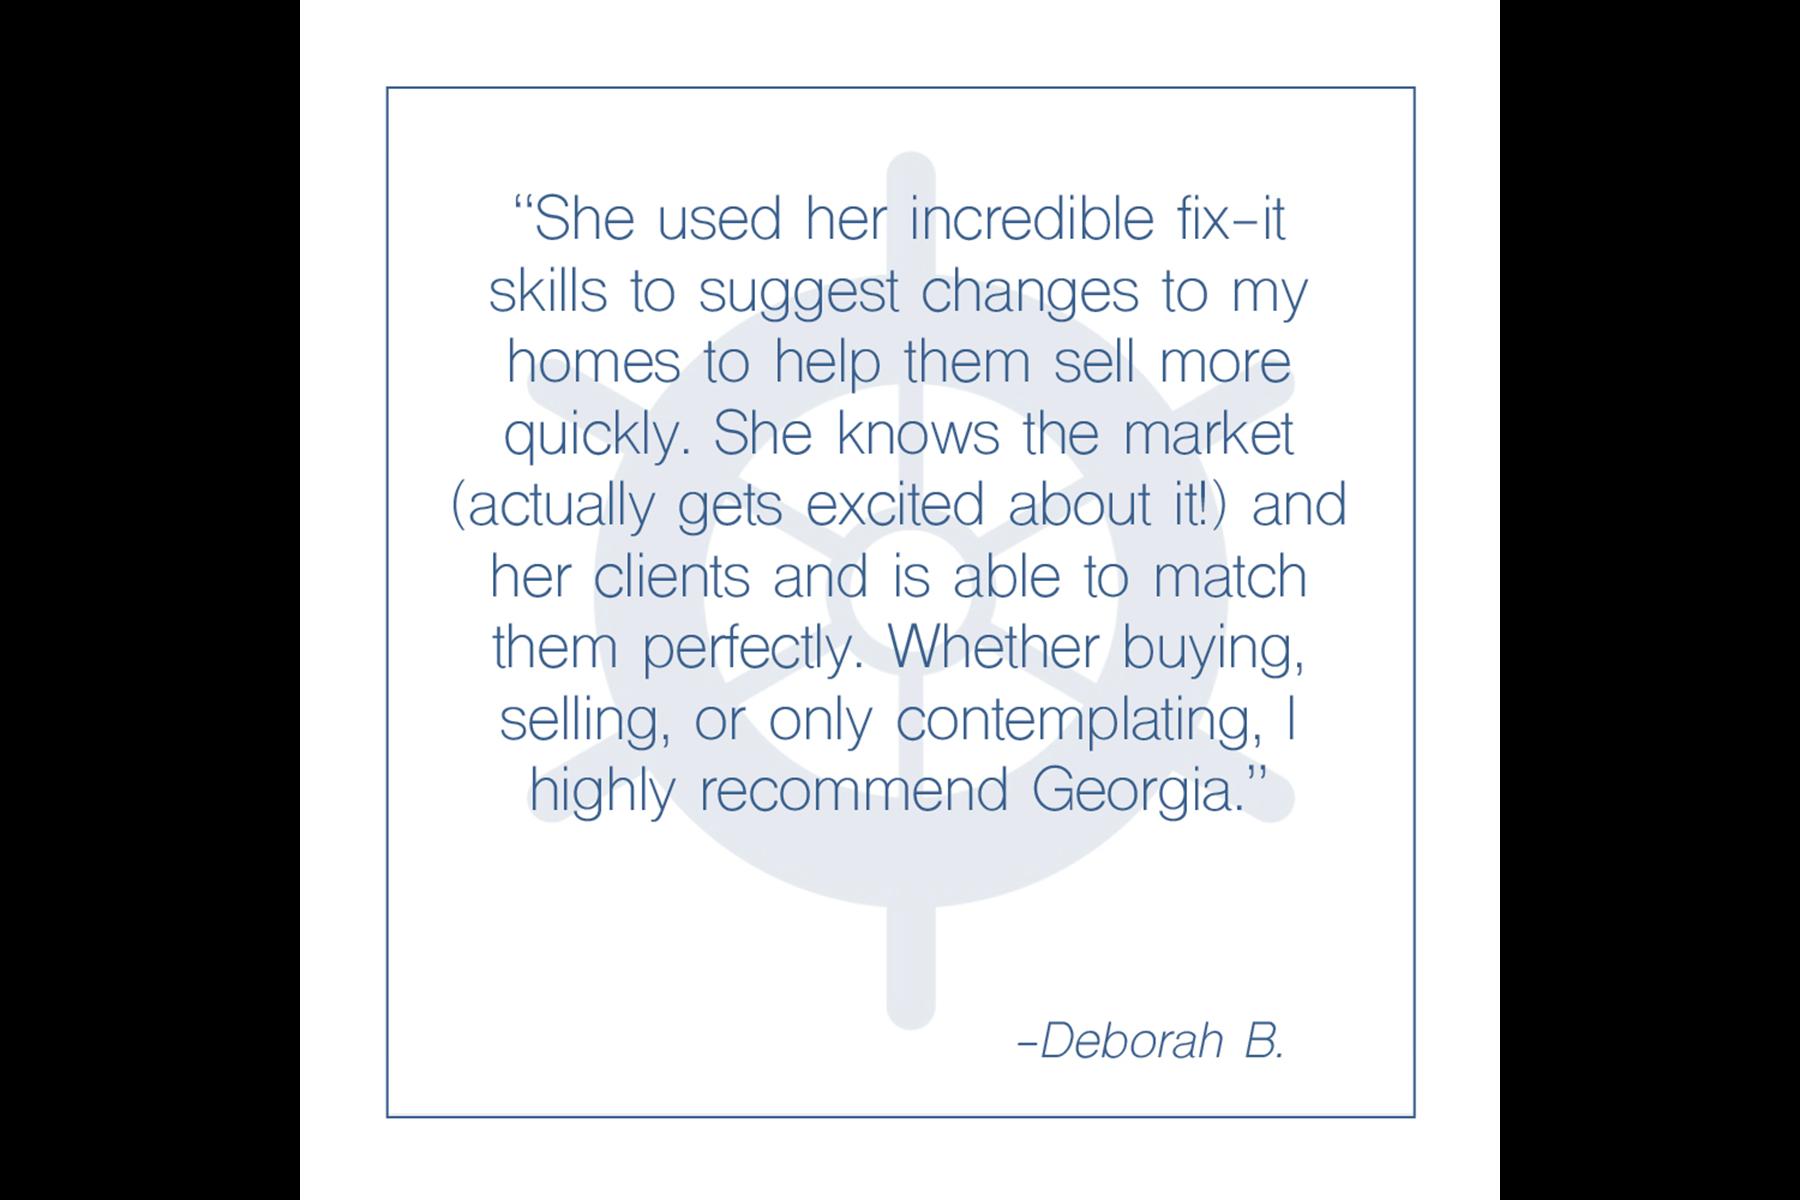 Deborah B